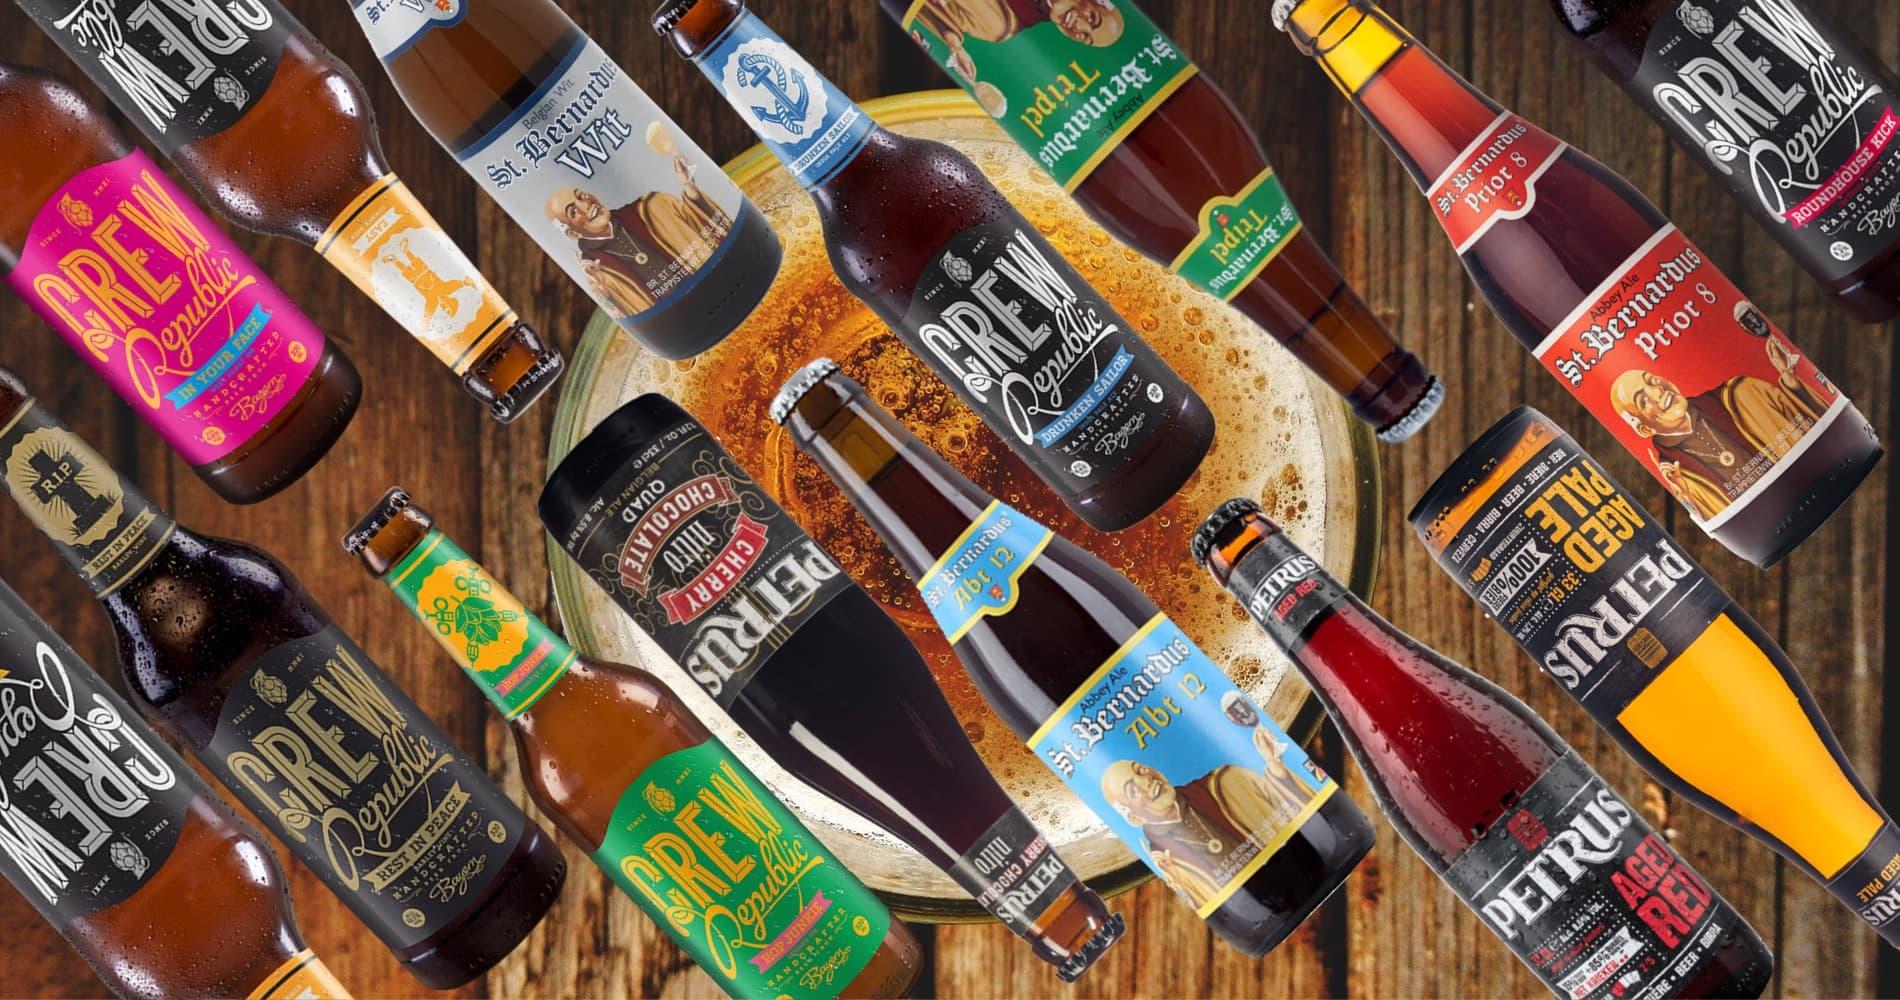 Beer & Ciders